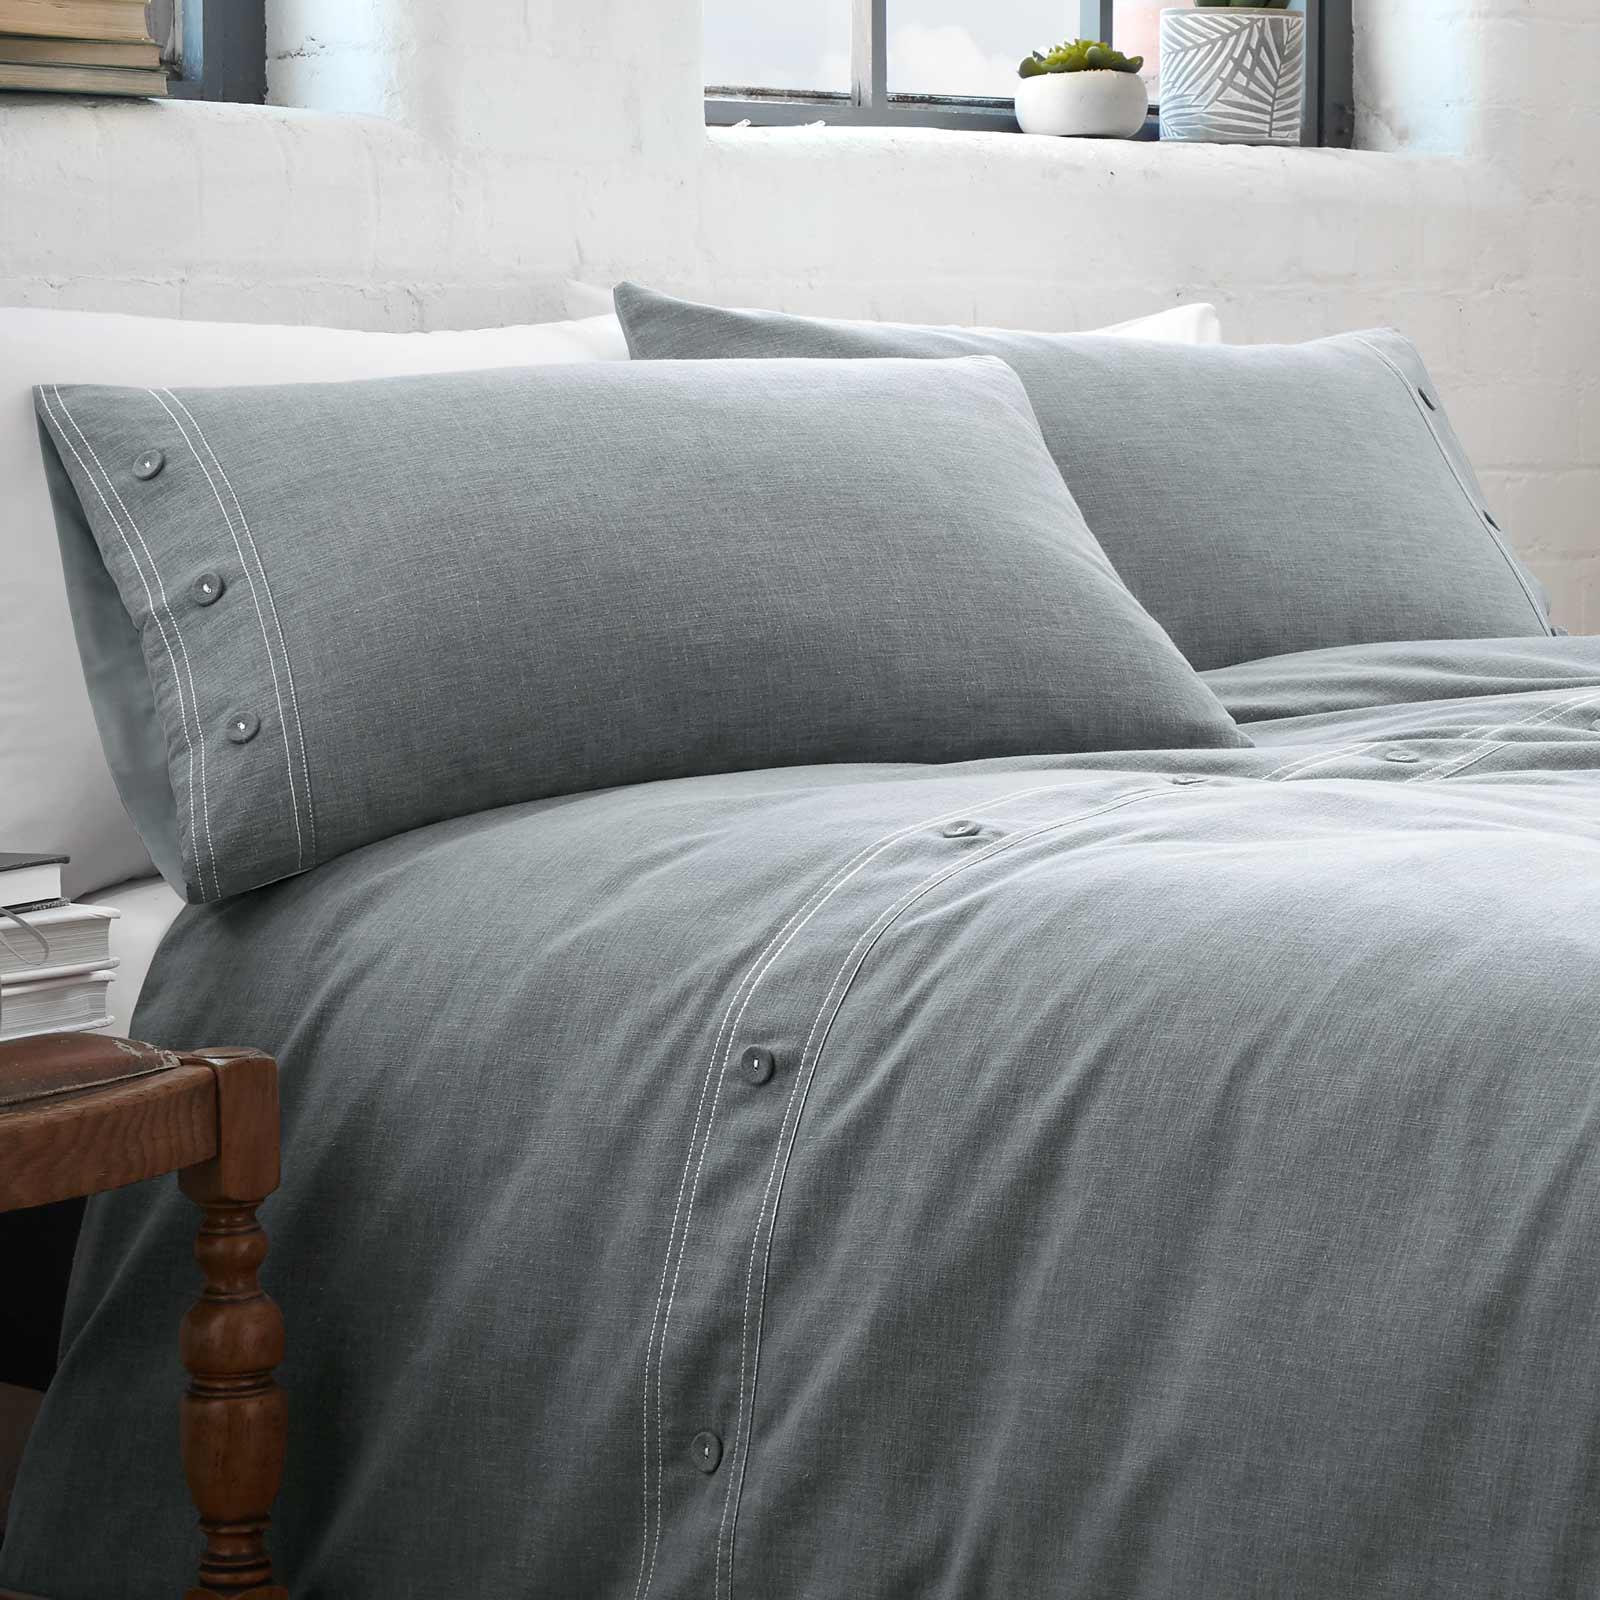 Azul-fundas-nordicas-Denim-Chambray-Boton-Detalle-de-lujo-cubierta-del-edredon-conjuntos-de-cama miniatura 19